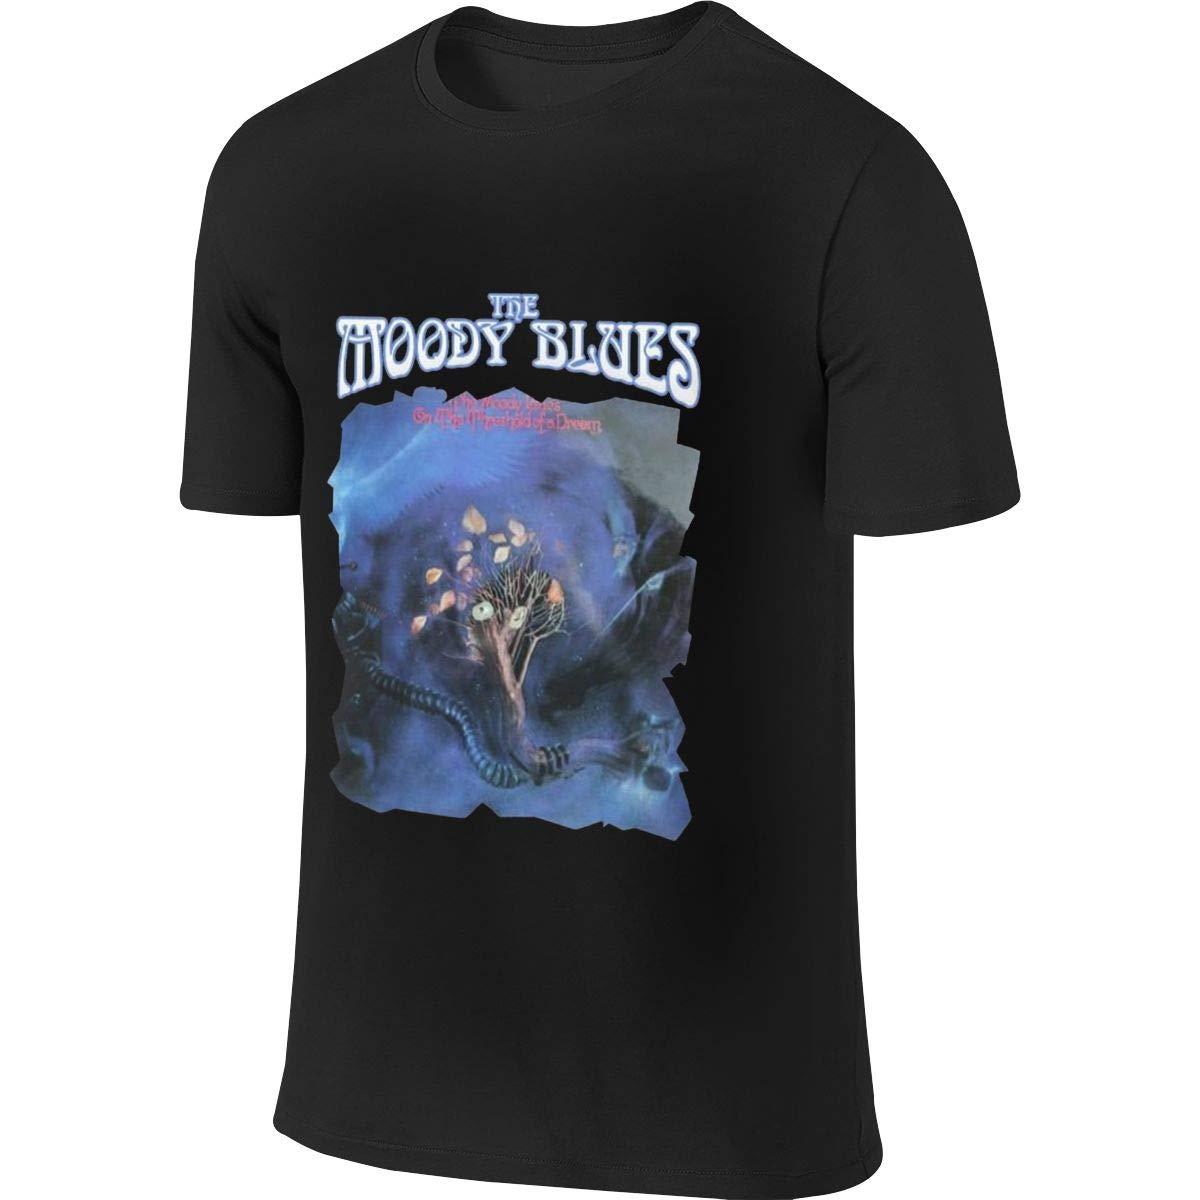 ACFUNEJRQ The Moody Blues Mens Cotton Round Neck Short Sleeve T-Shirts